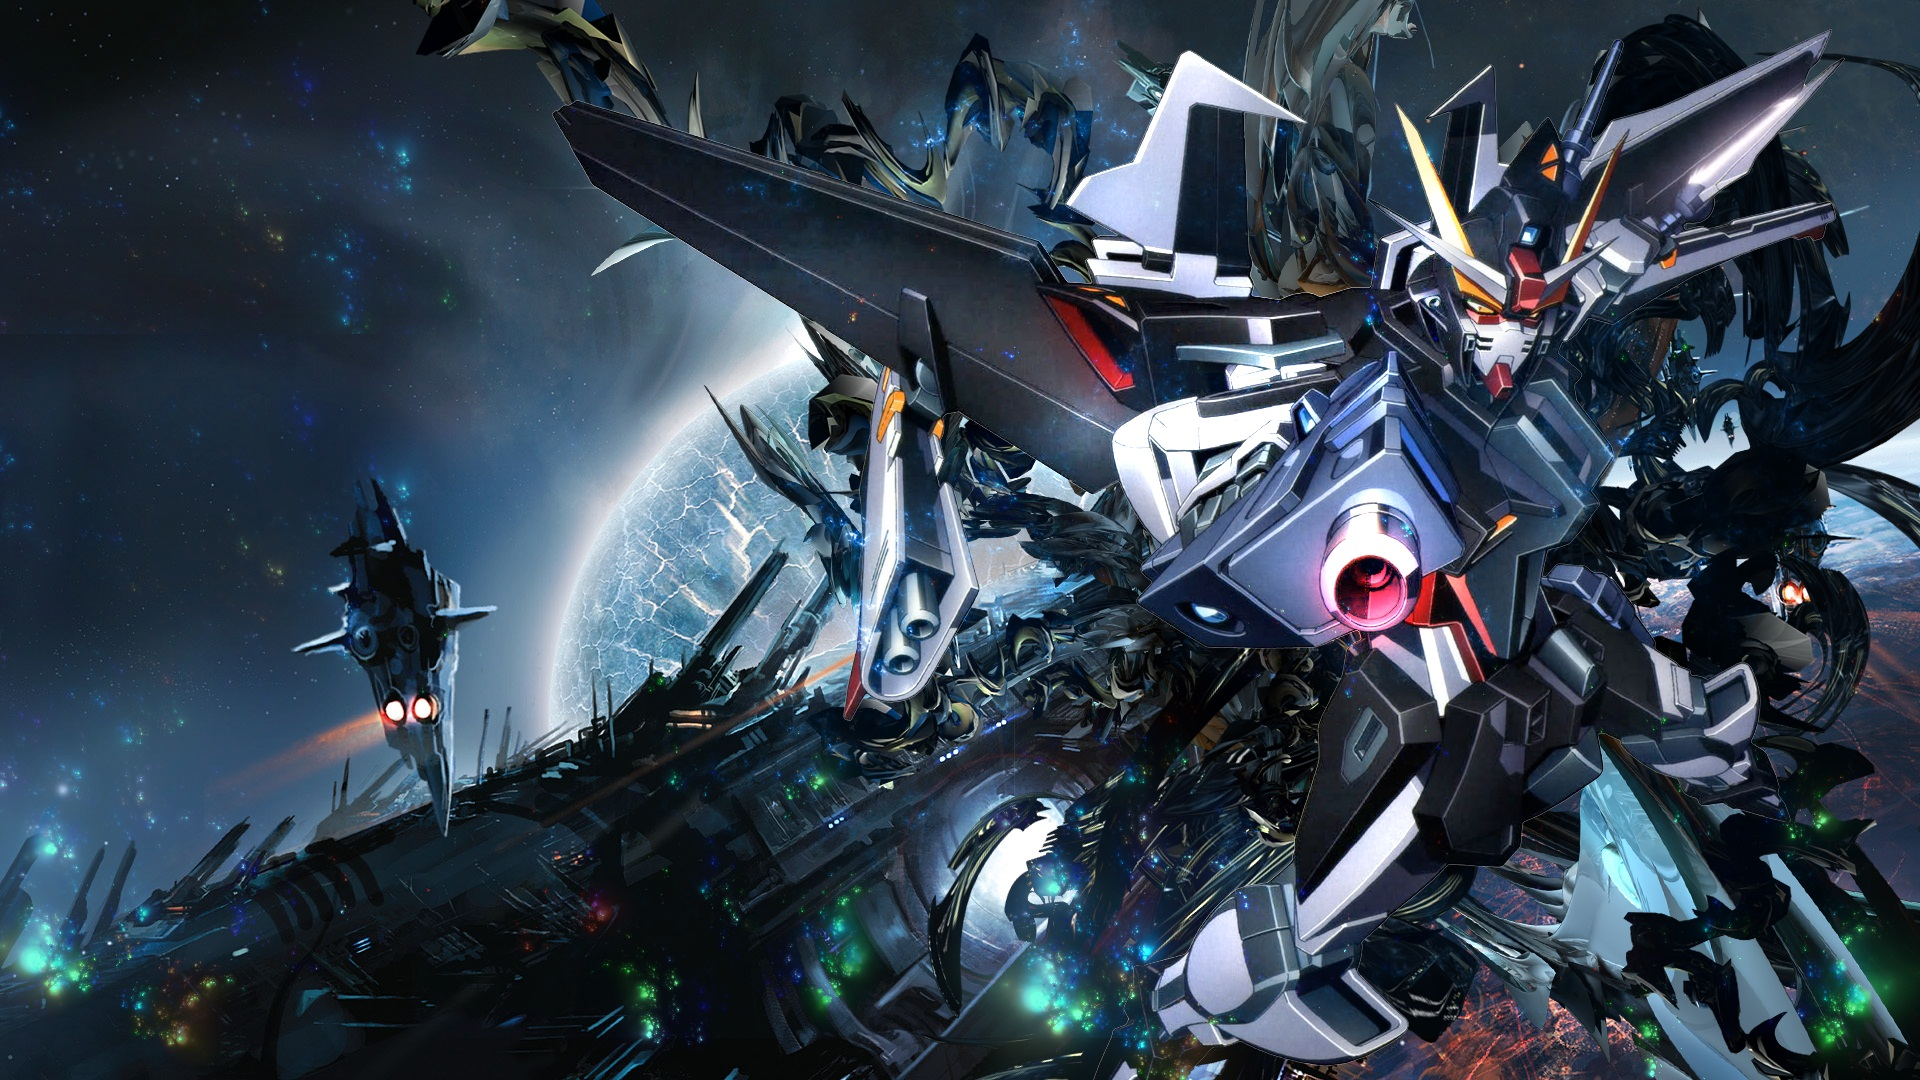 Nice wallpapers Gundam 1920x1080px